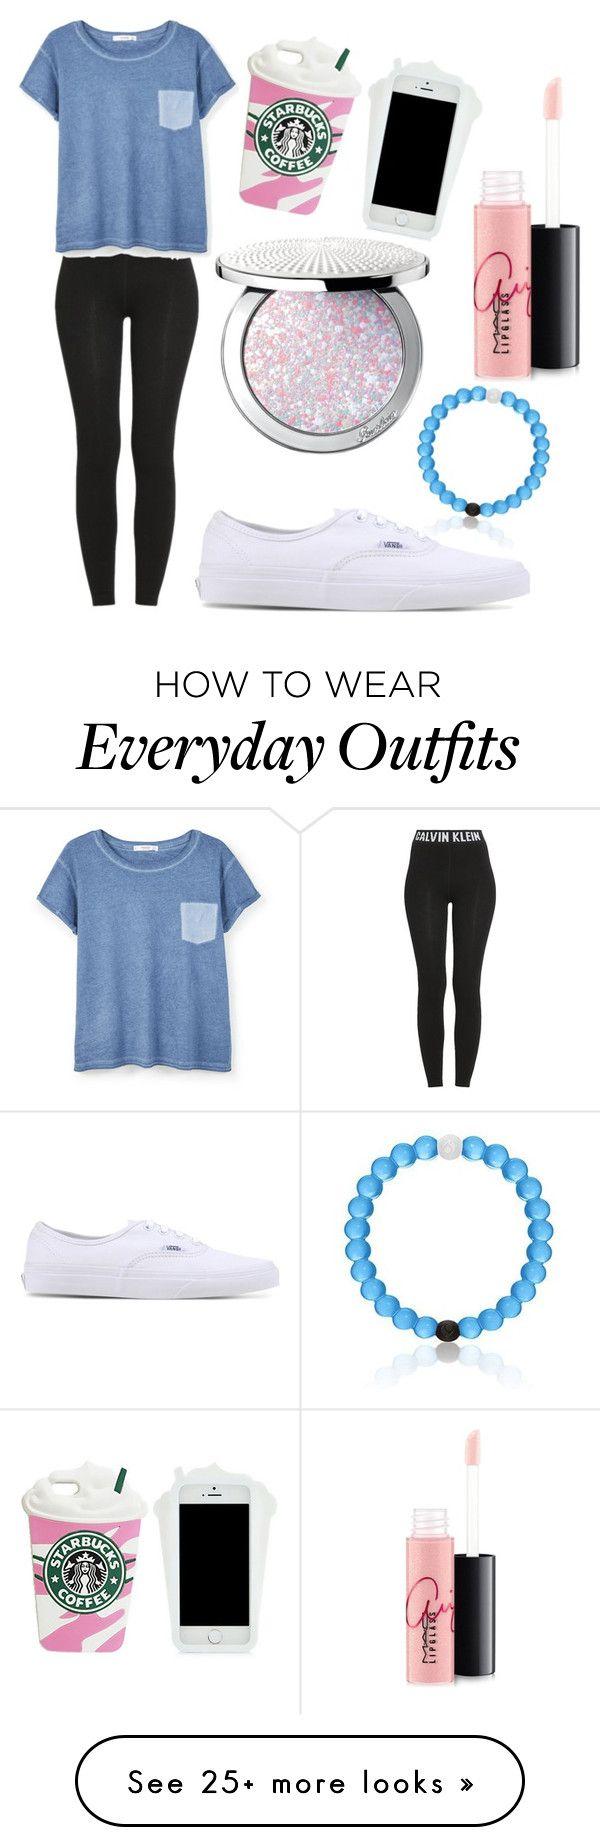 t-shirt+ broek+ sneakers+ highlighter+ armbandje+ lipgloss+ gsm